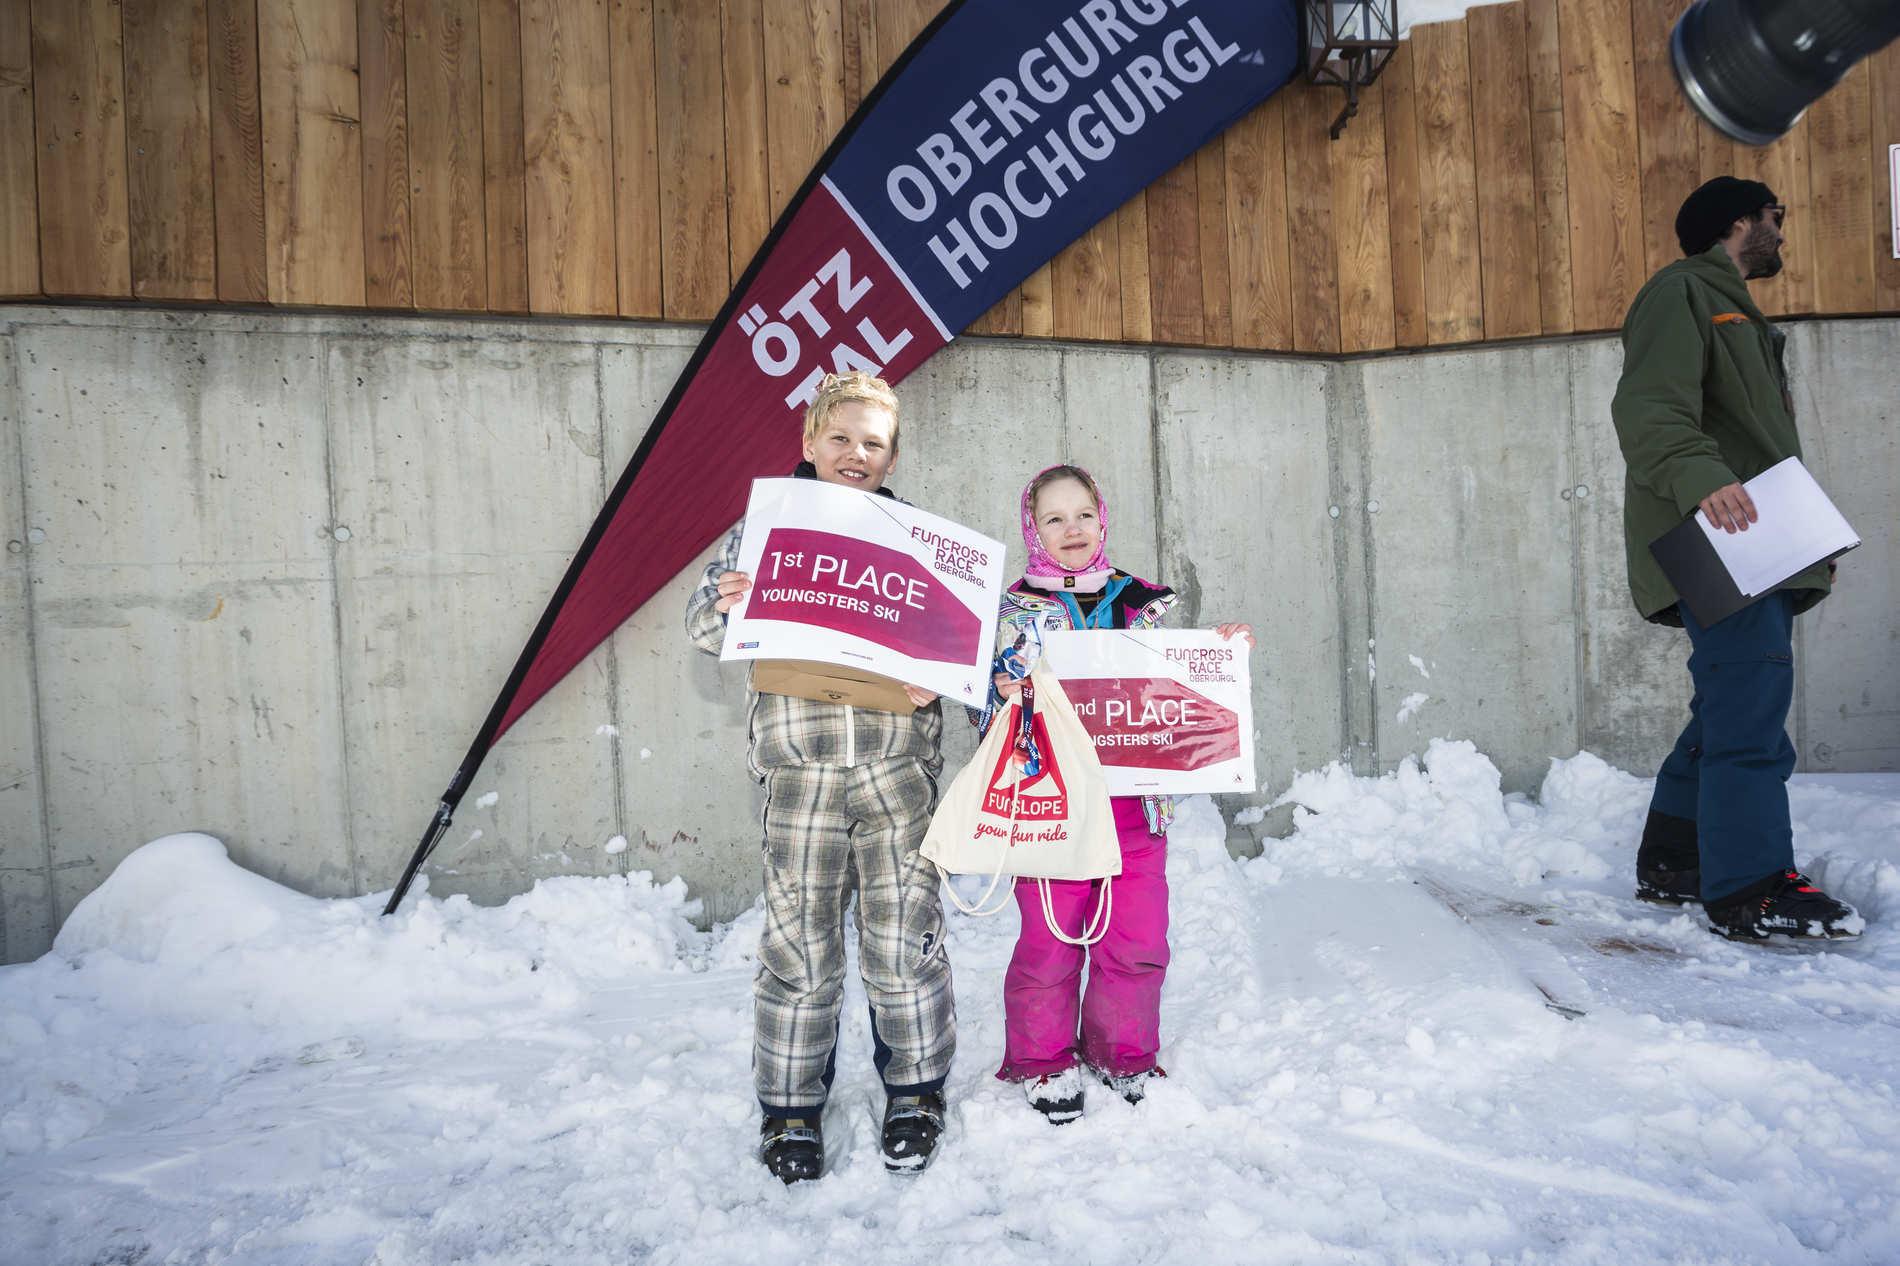 obergurgl 08 03 2018 lifestyle roland haschka qparks 032